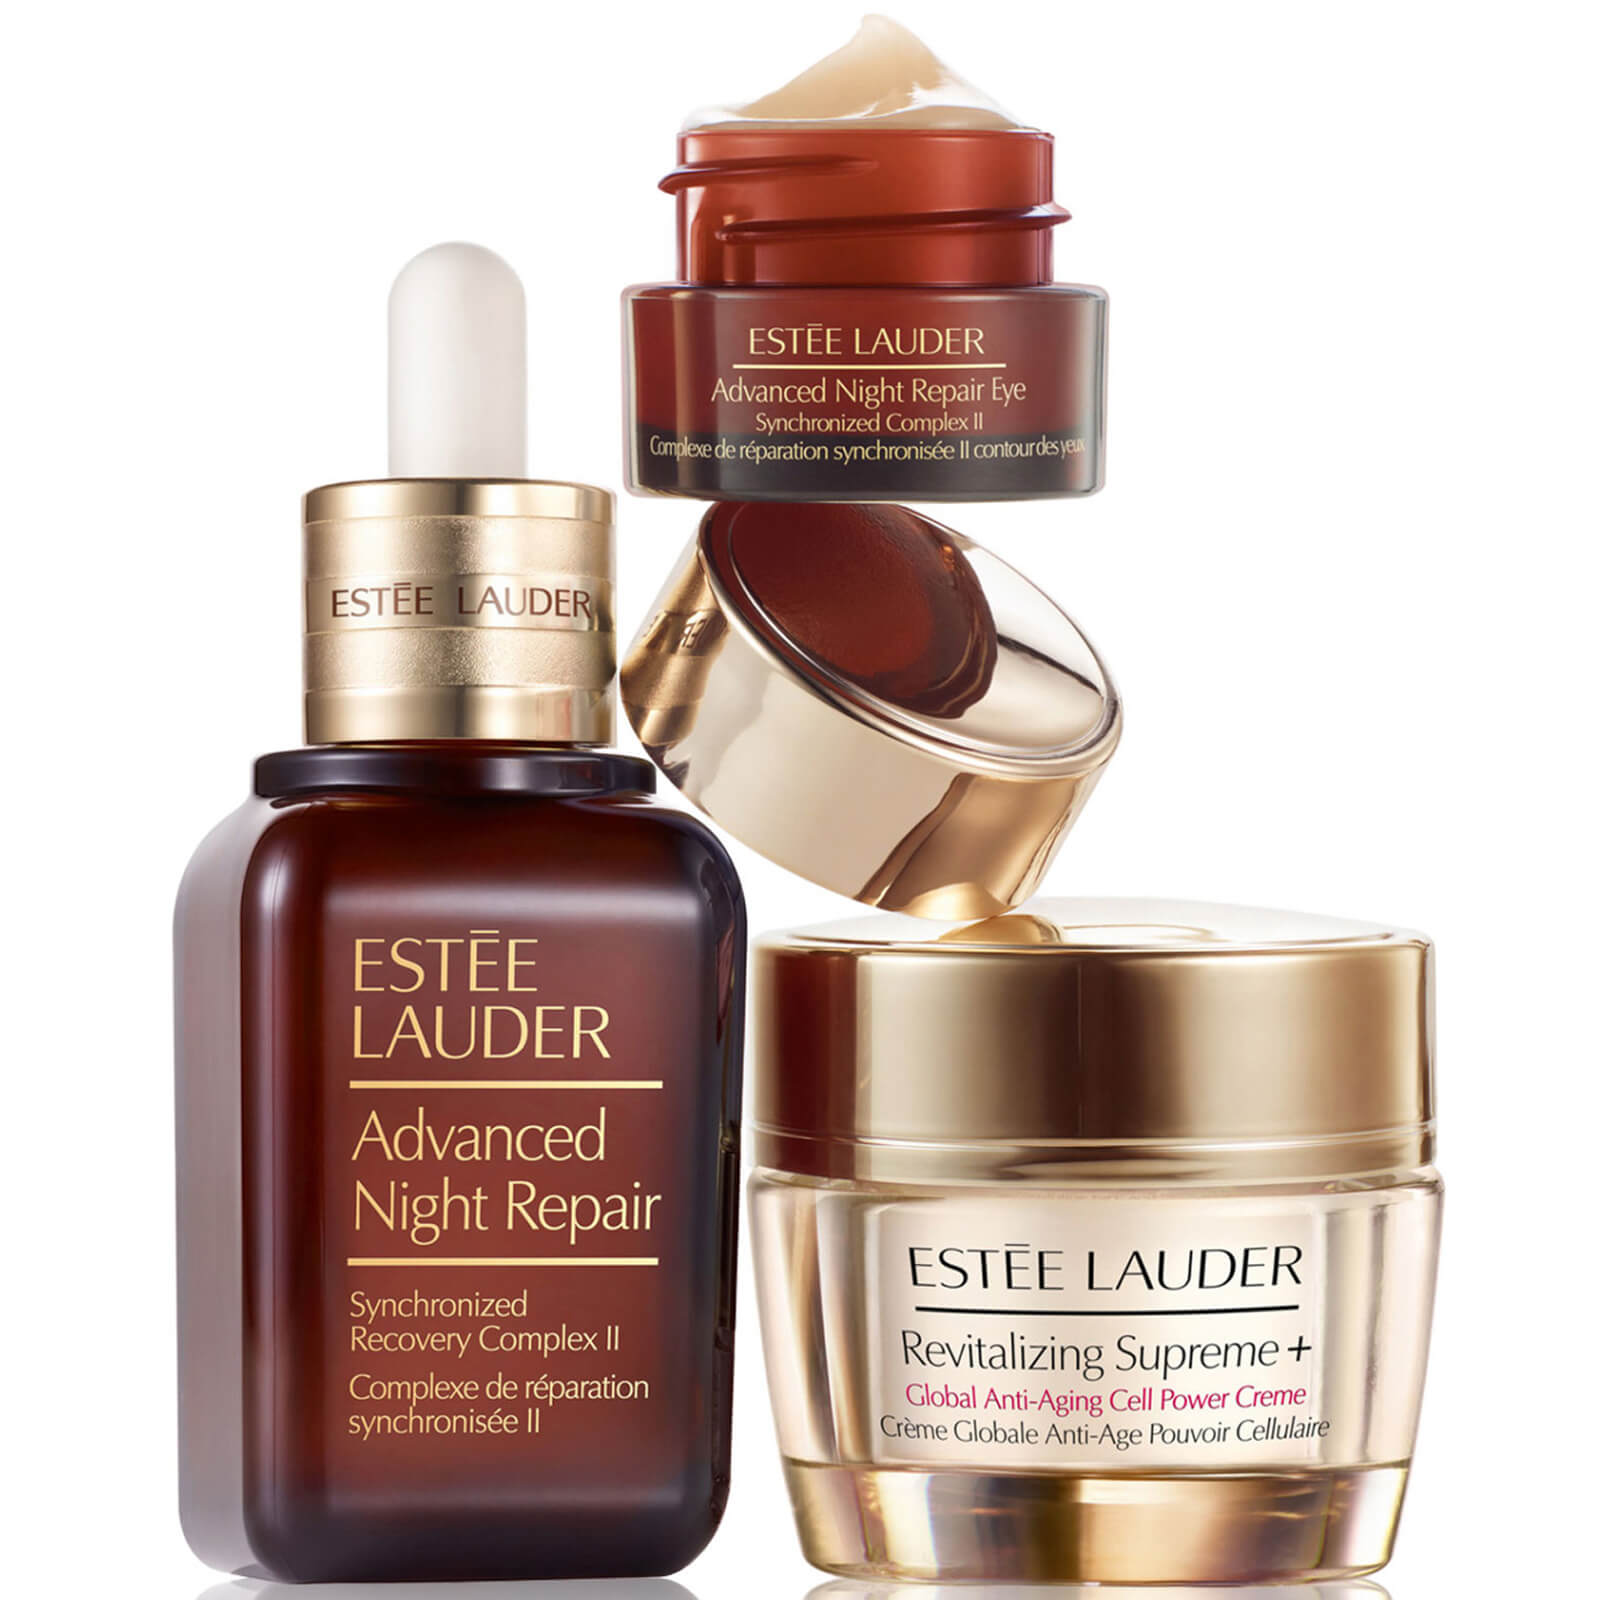 Estee Lauder Global Anti Aging Set With Full Size Advanced Night Repair Lookfantastic